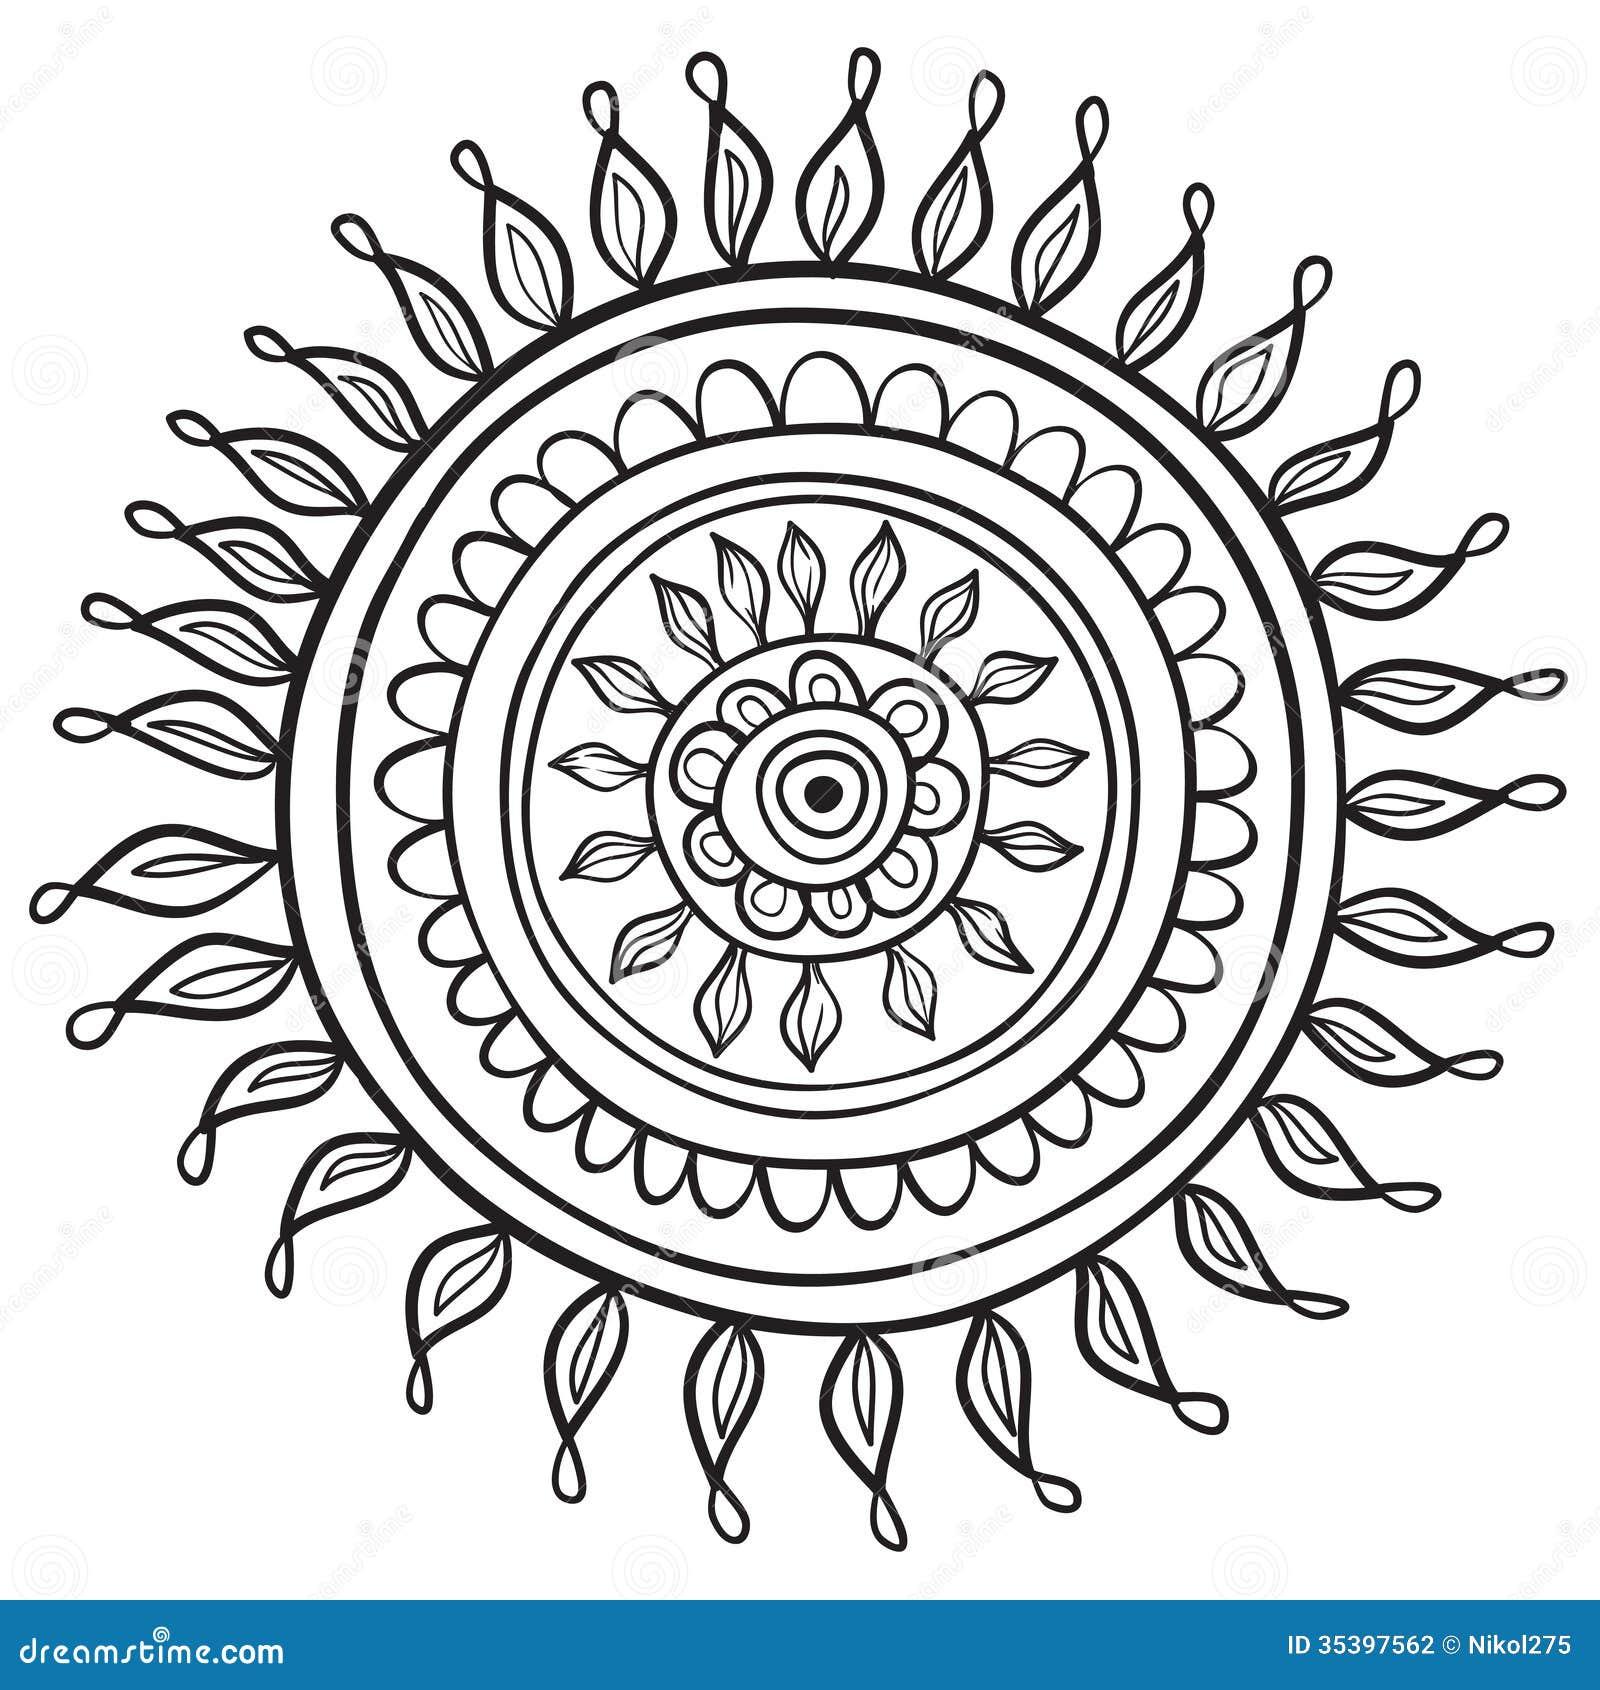 Free ornamental mandala vector download free vector art stock - Mandala Pattern Stock Photography Image 35397562